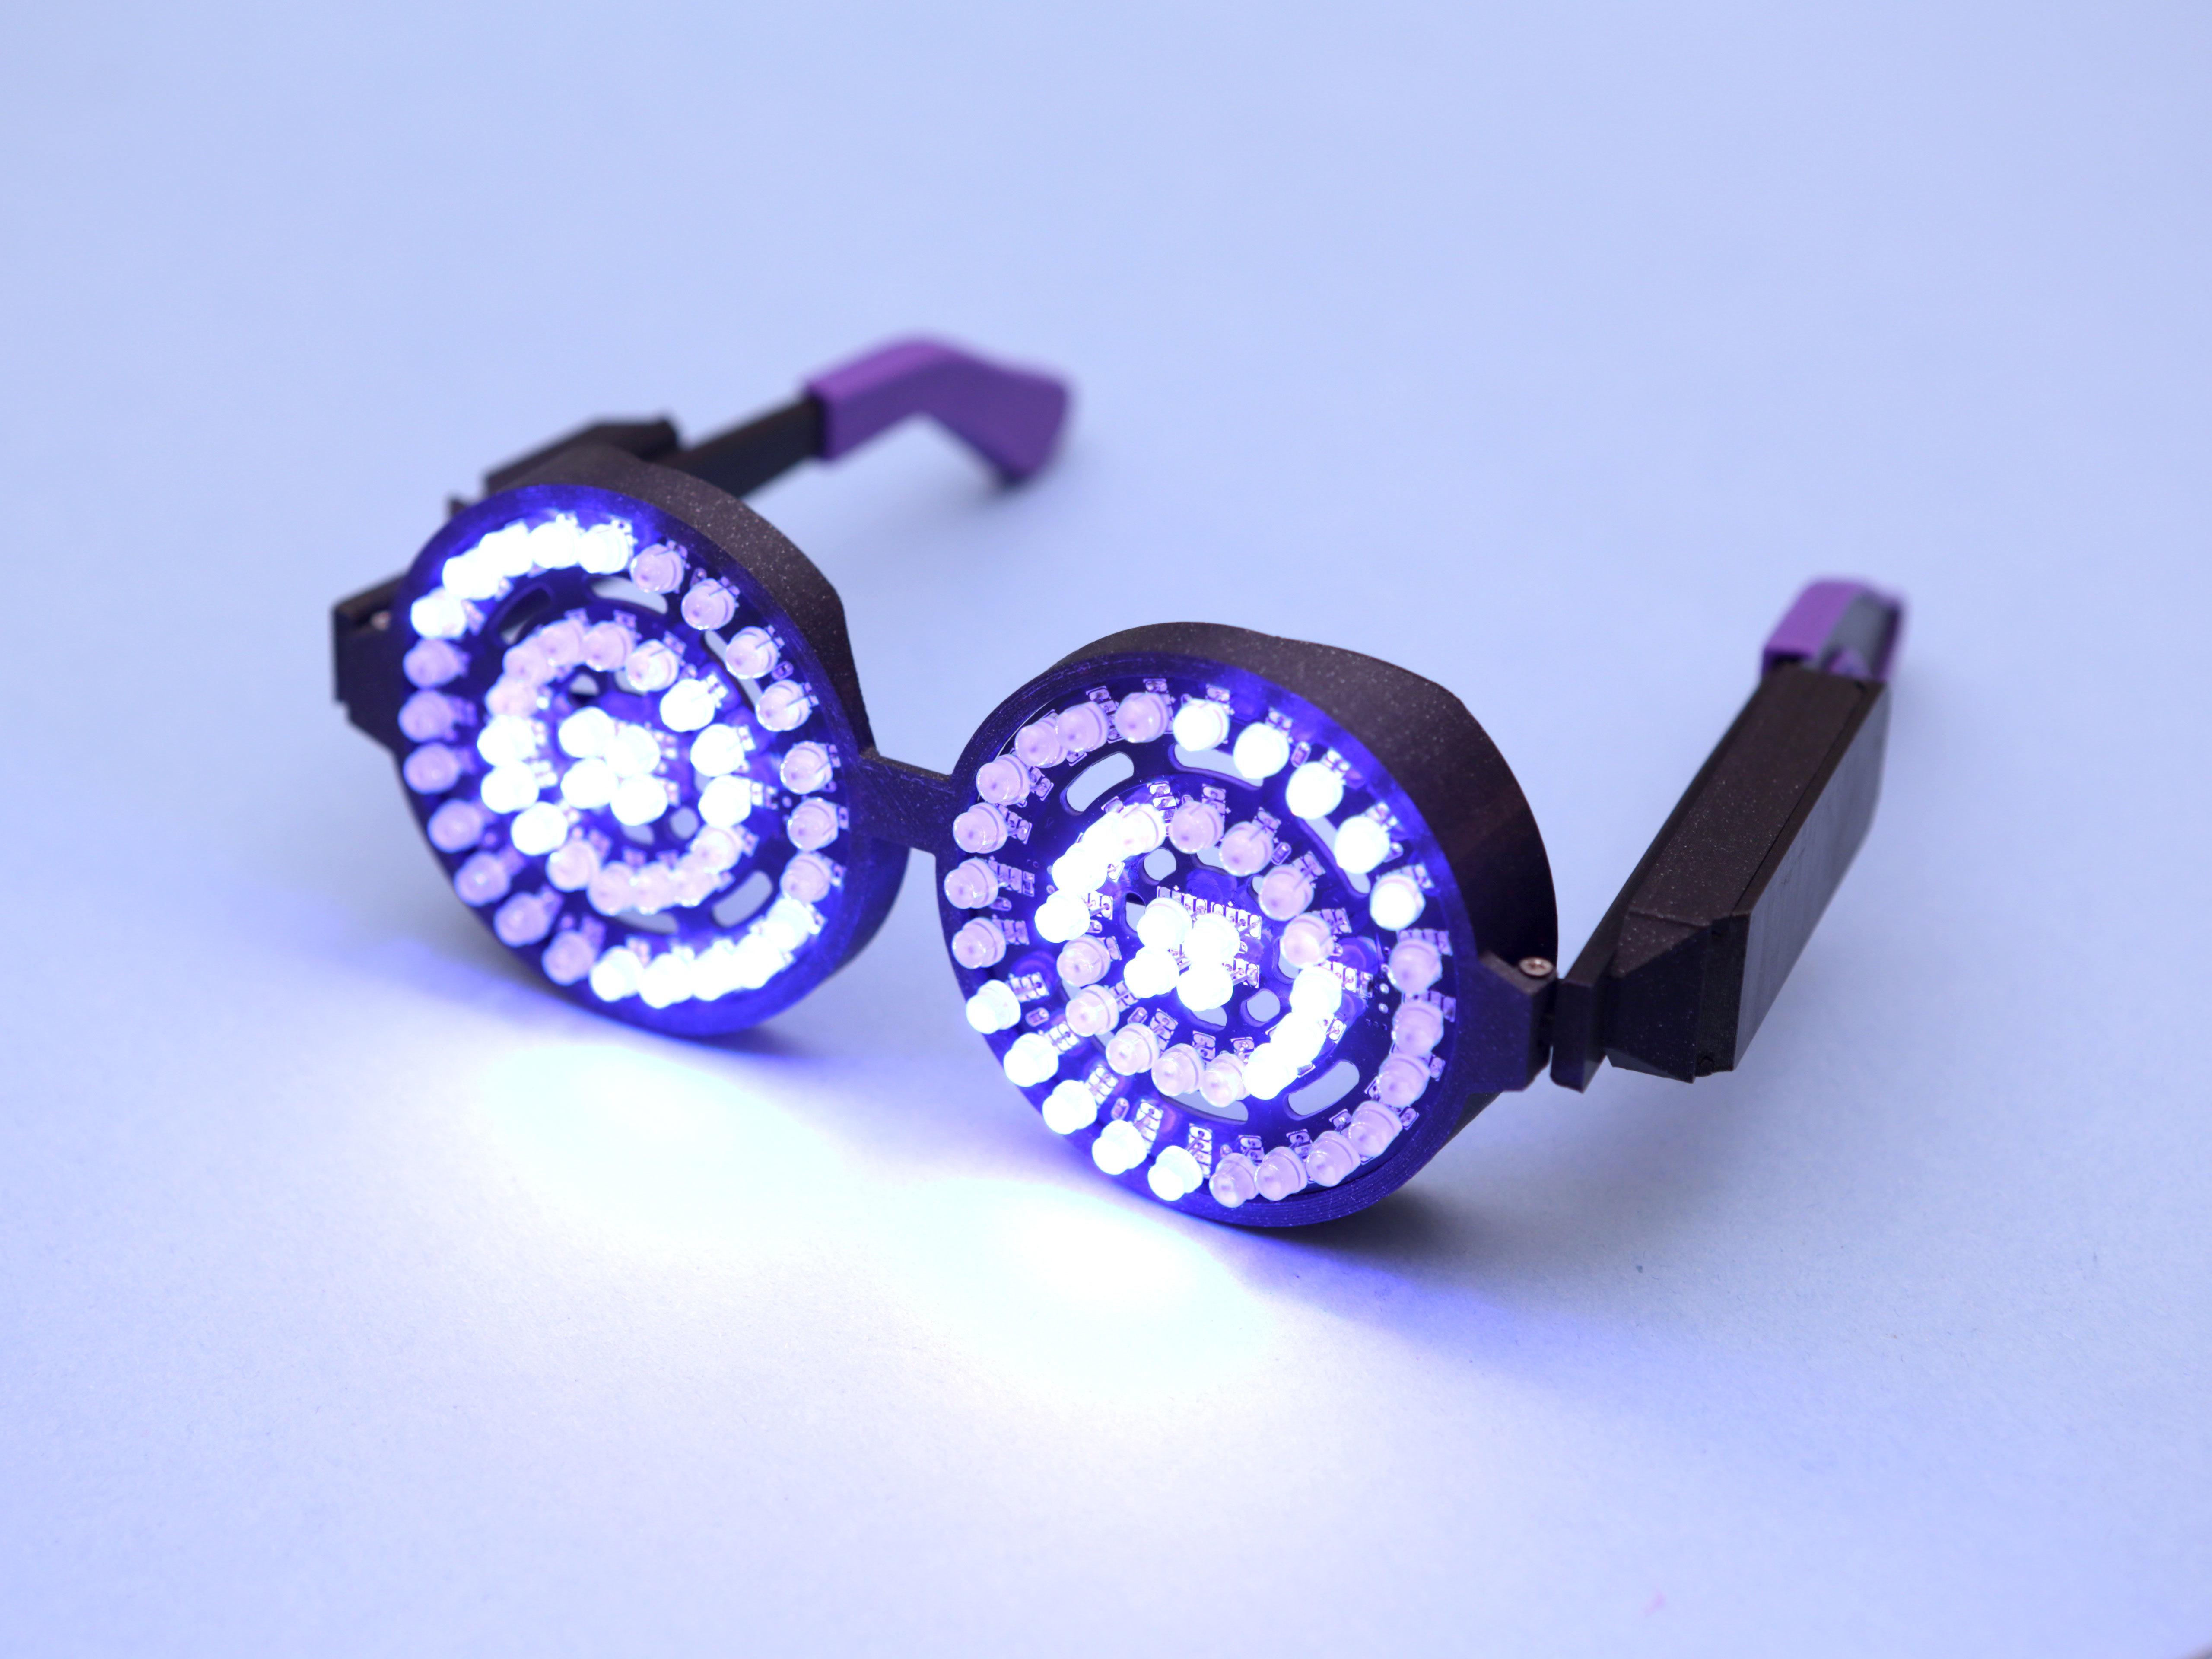 hero-blue-2.jpg Download free STL file Rezz-Inspired NeoPixel Glasses • 3D printing template, Adafruit